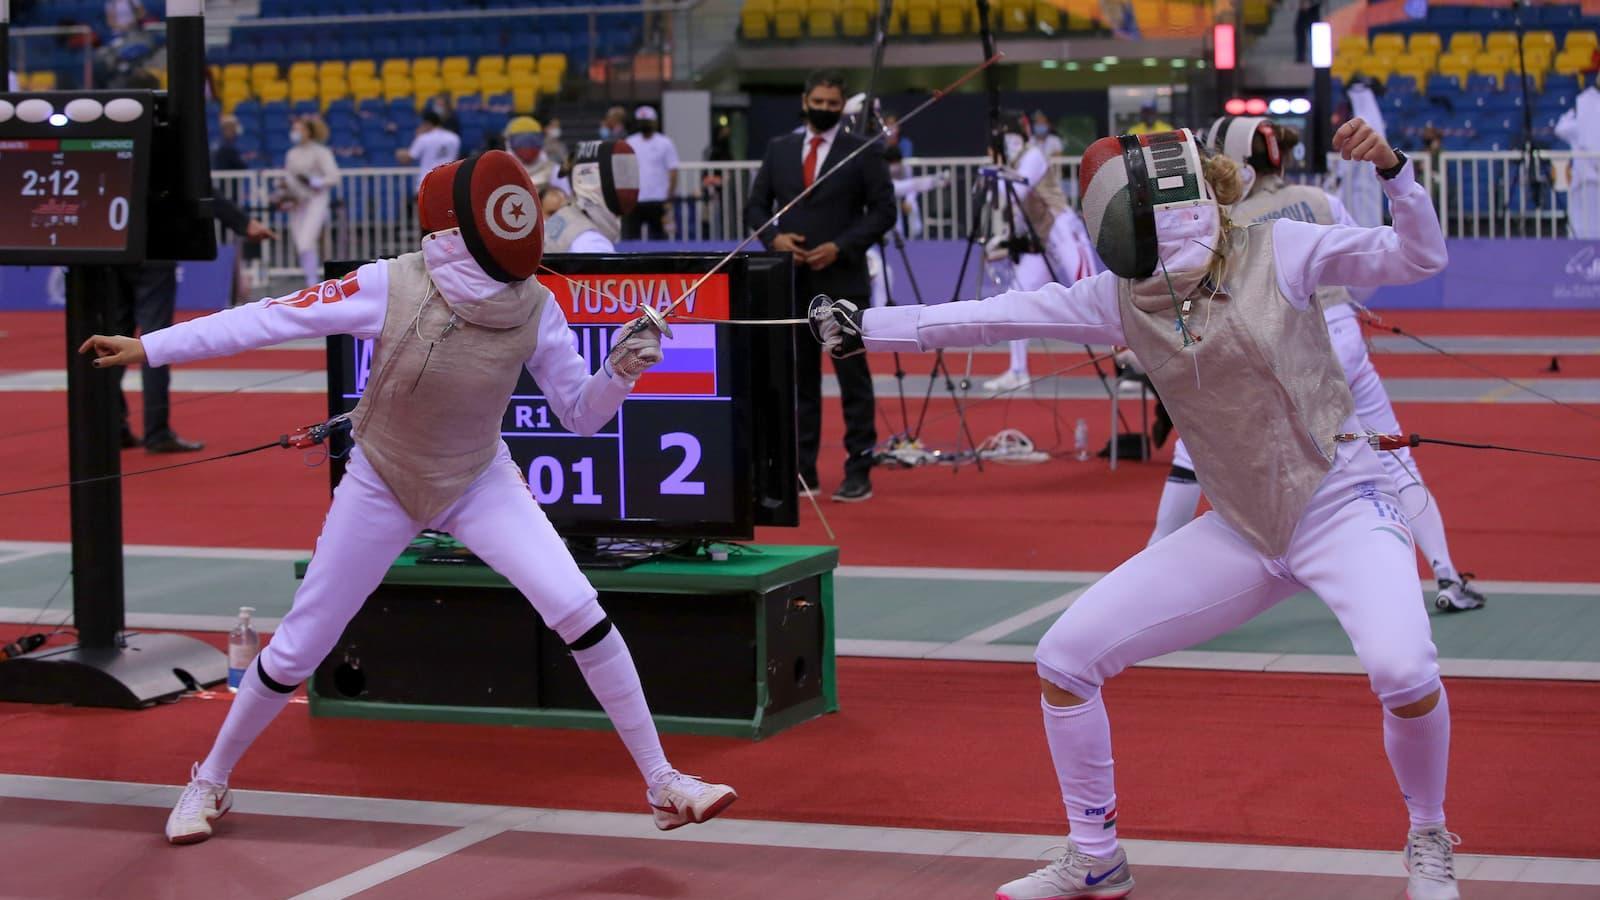 Rio Games bronze medalist Boubakri, world No. 30 Walczyk dumped out of Grand Prix Doha 2021